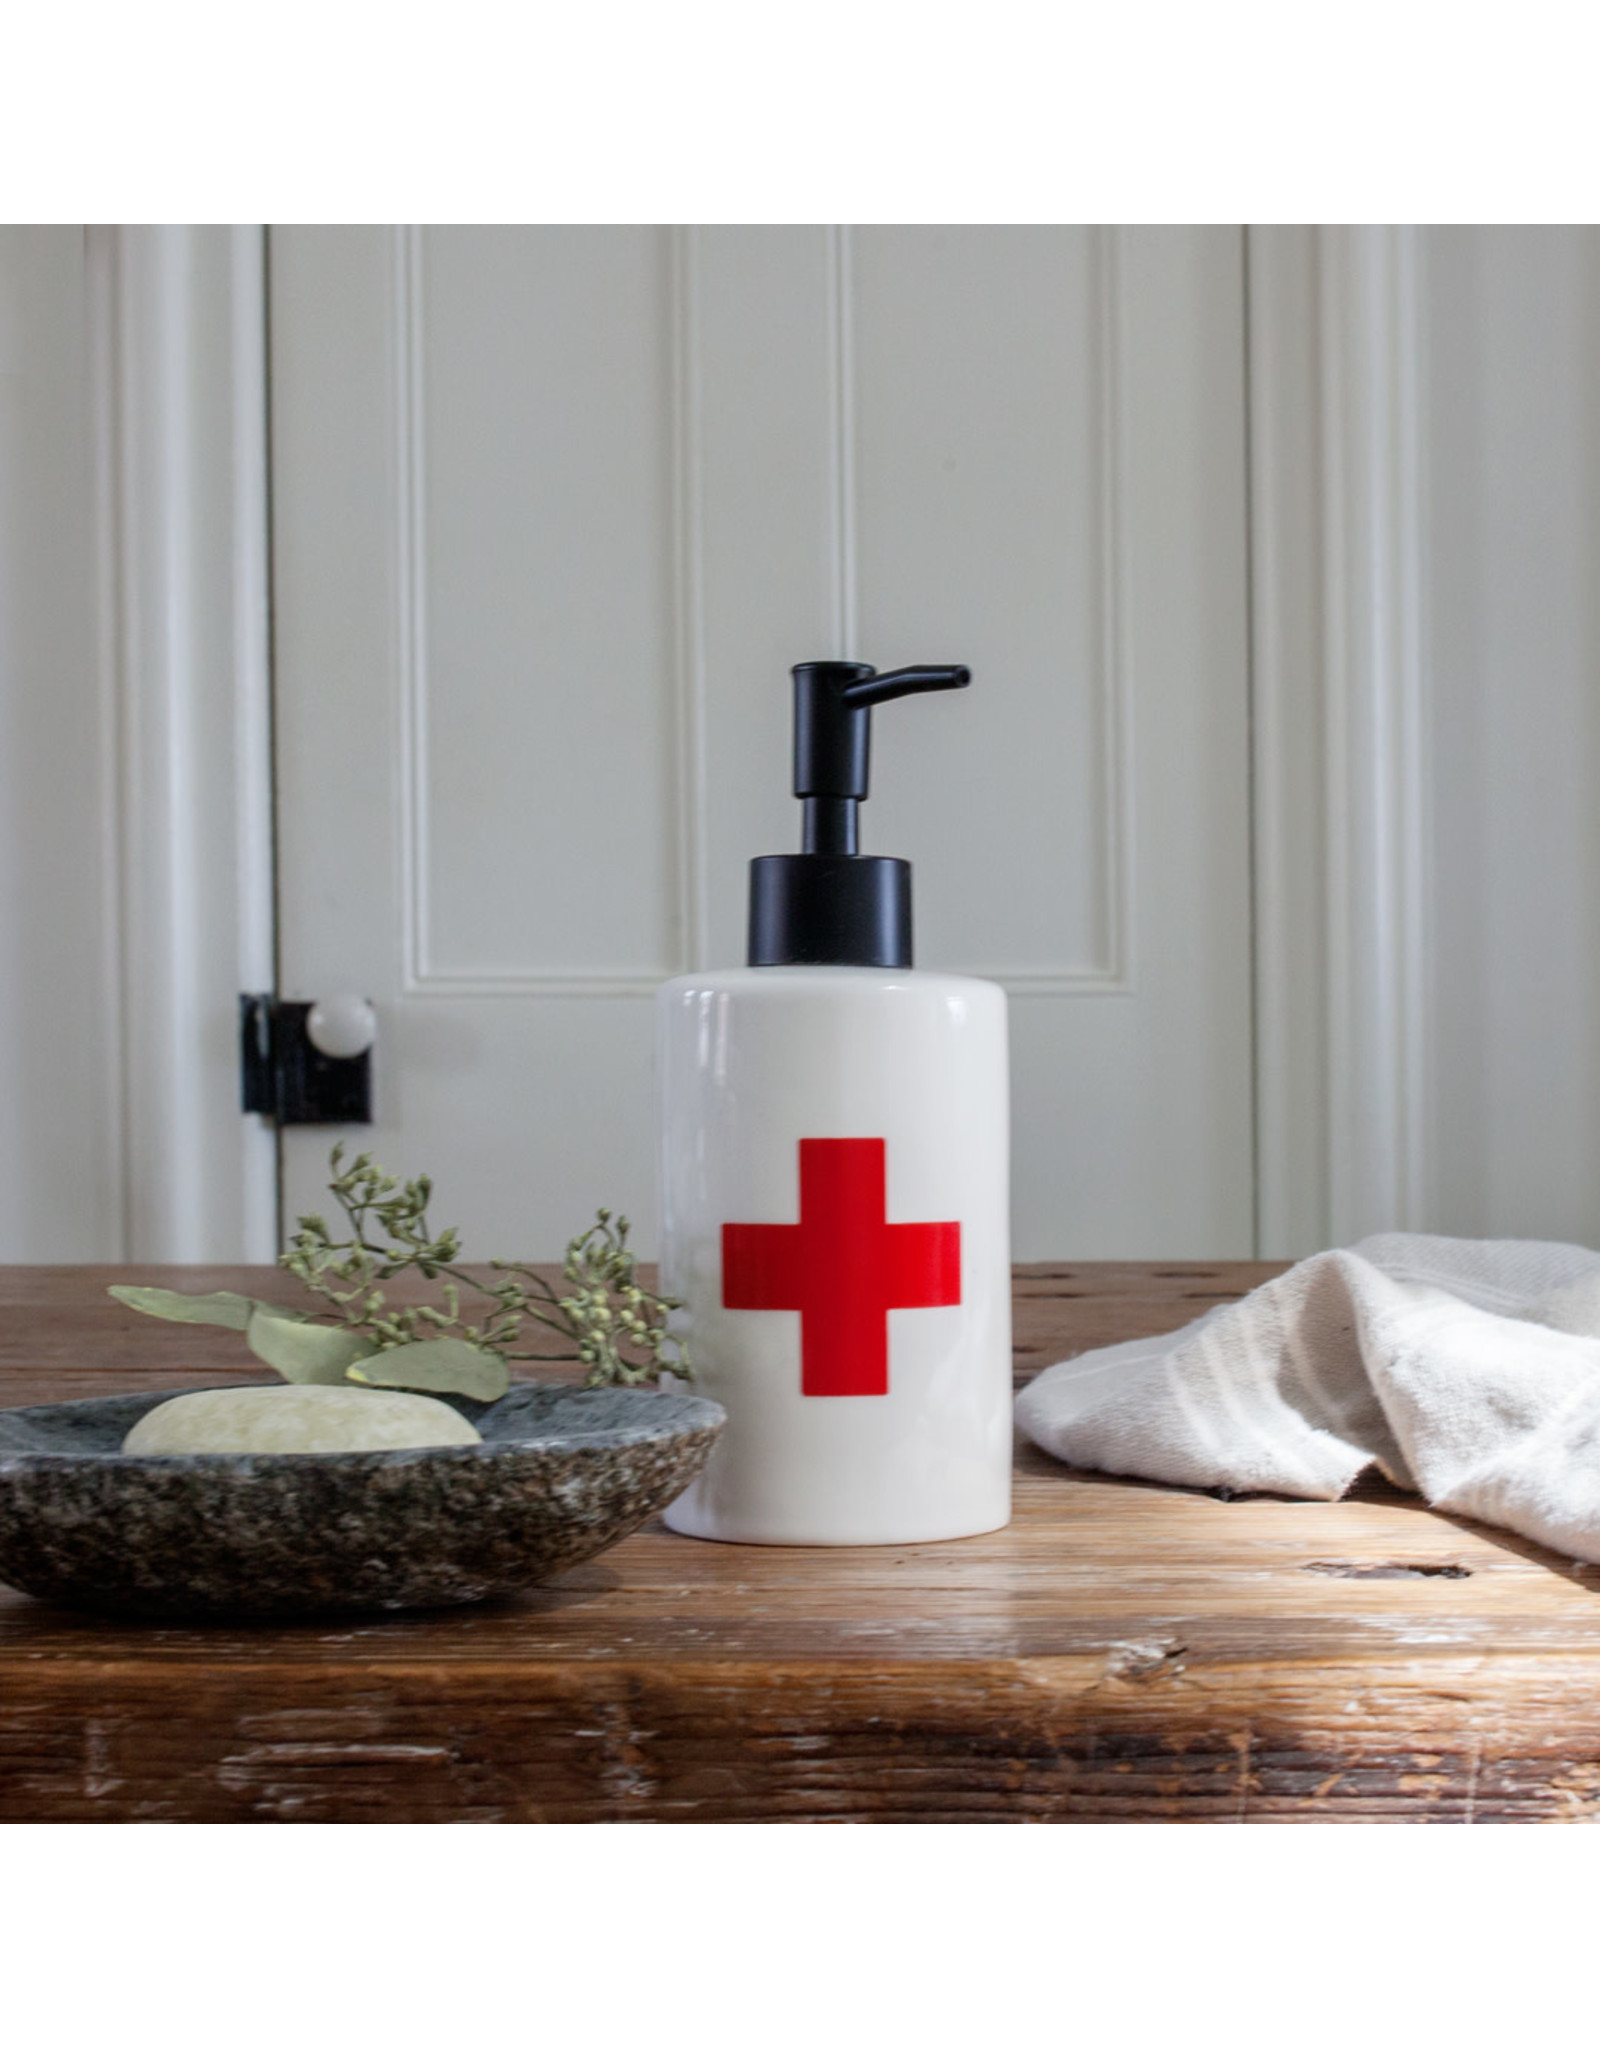 Soap Pump - Red Cross